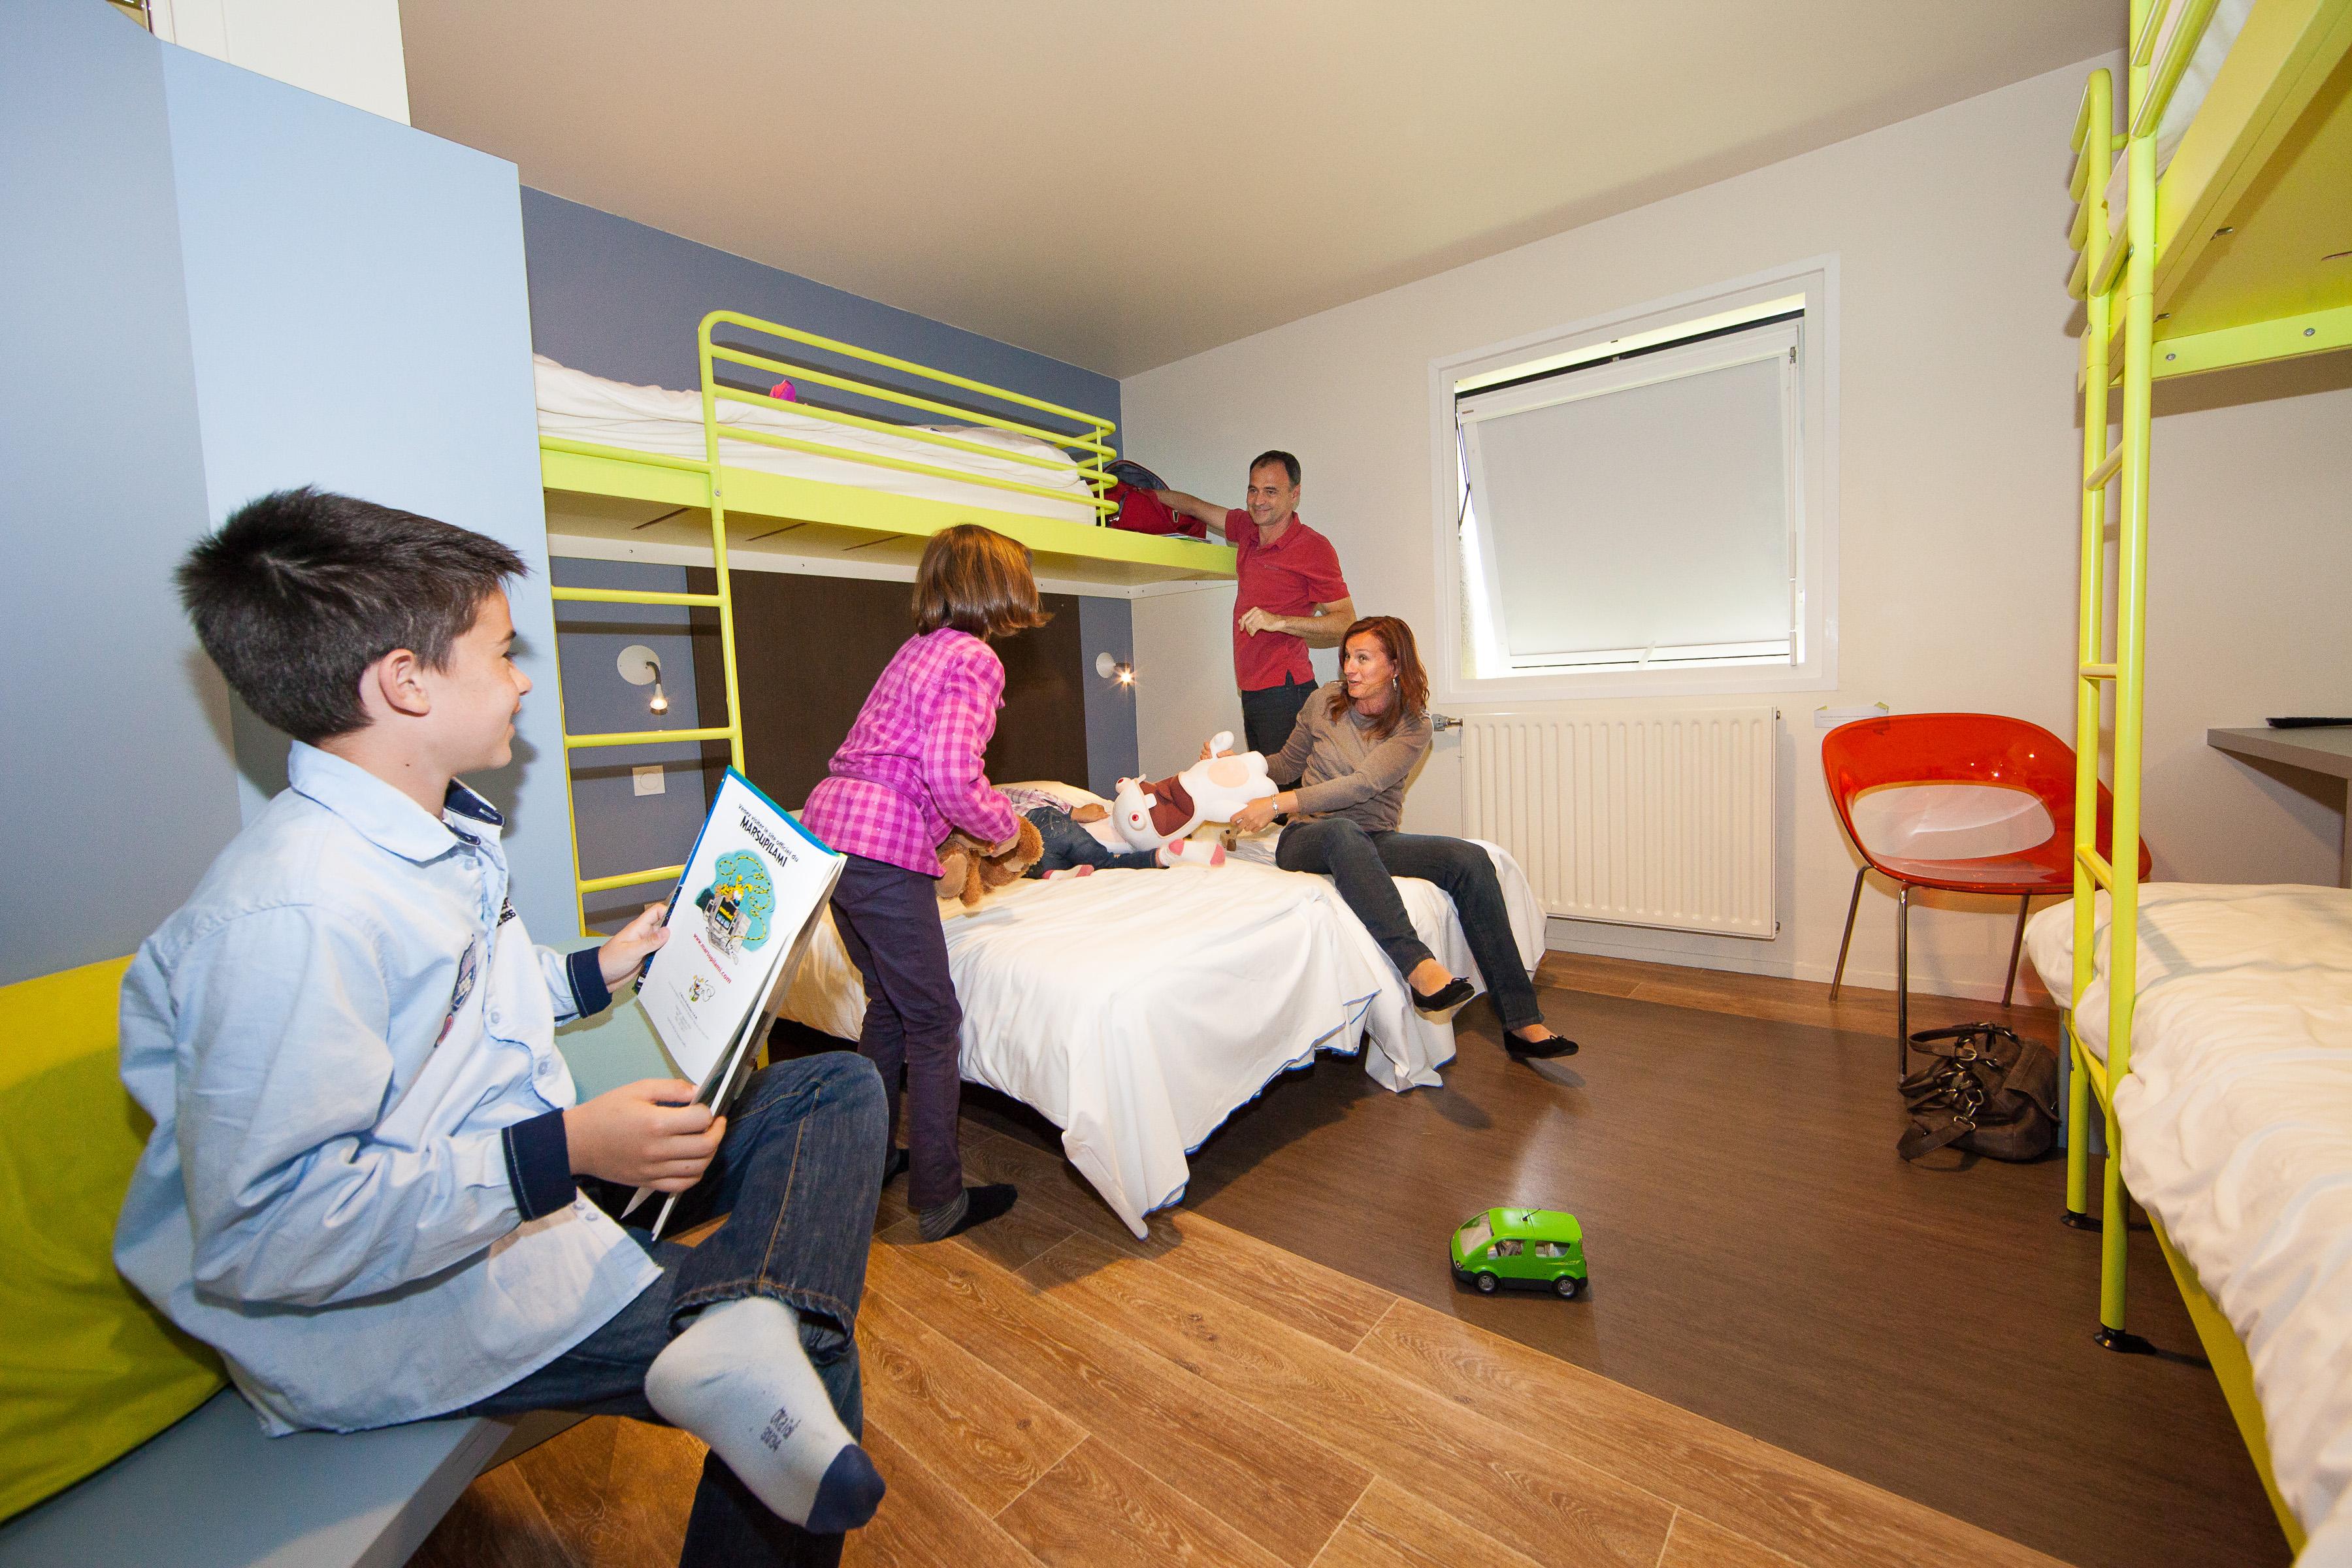 futuroscope office de tourisme de chasseneuil. Black Bedroom Furniture Sets. Home Design Ideas